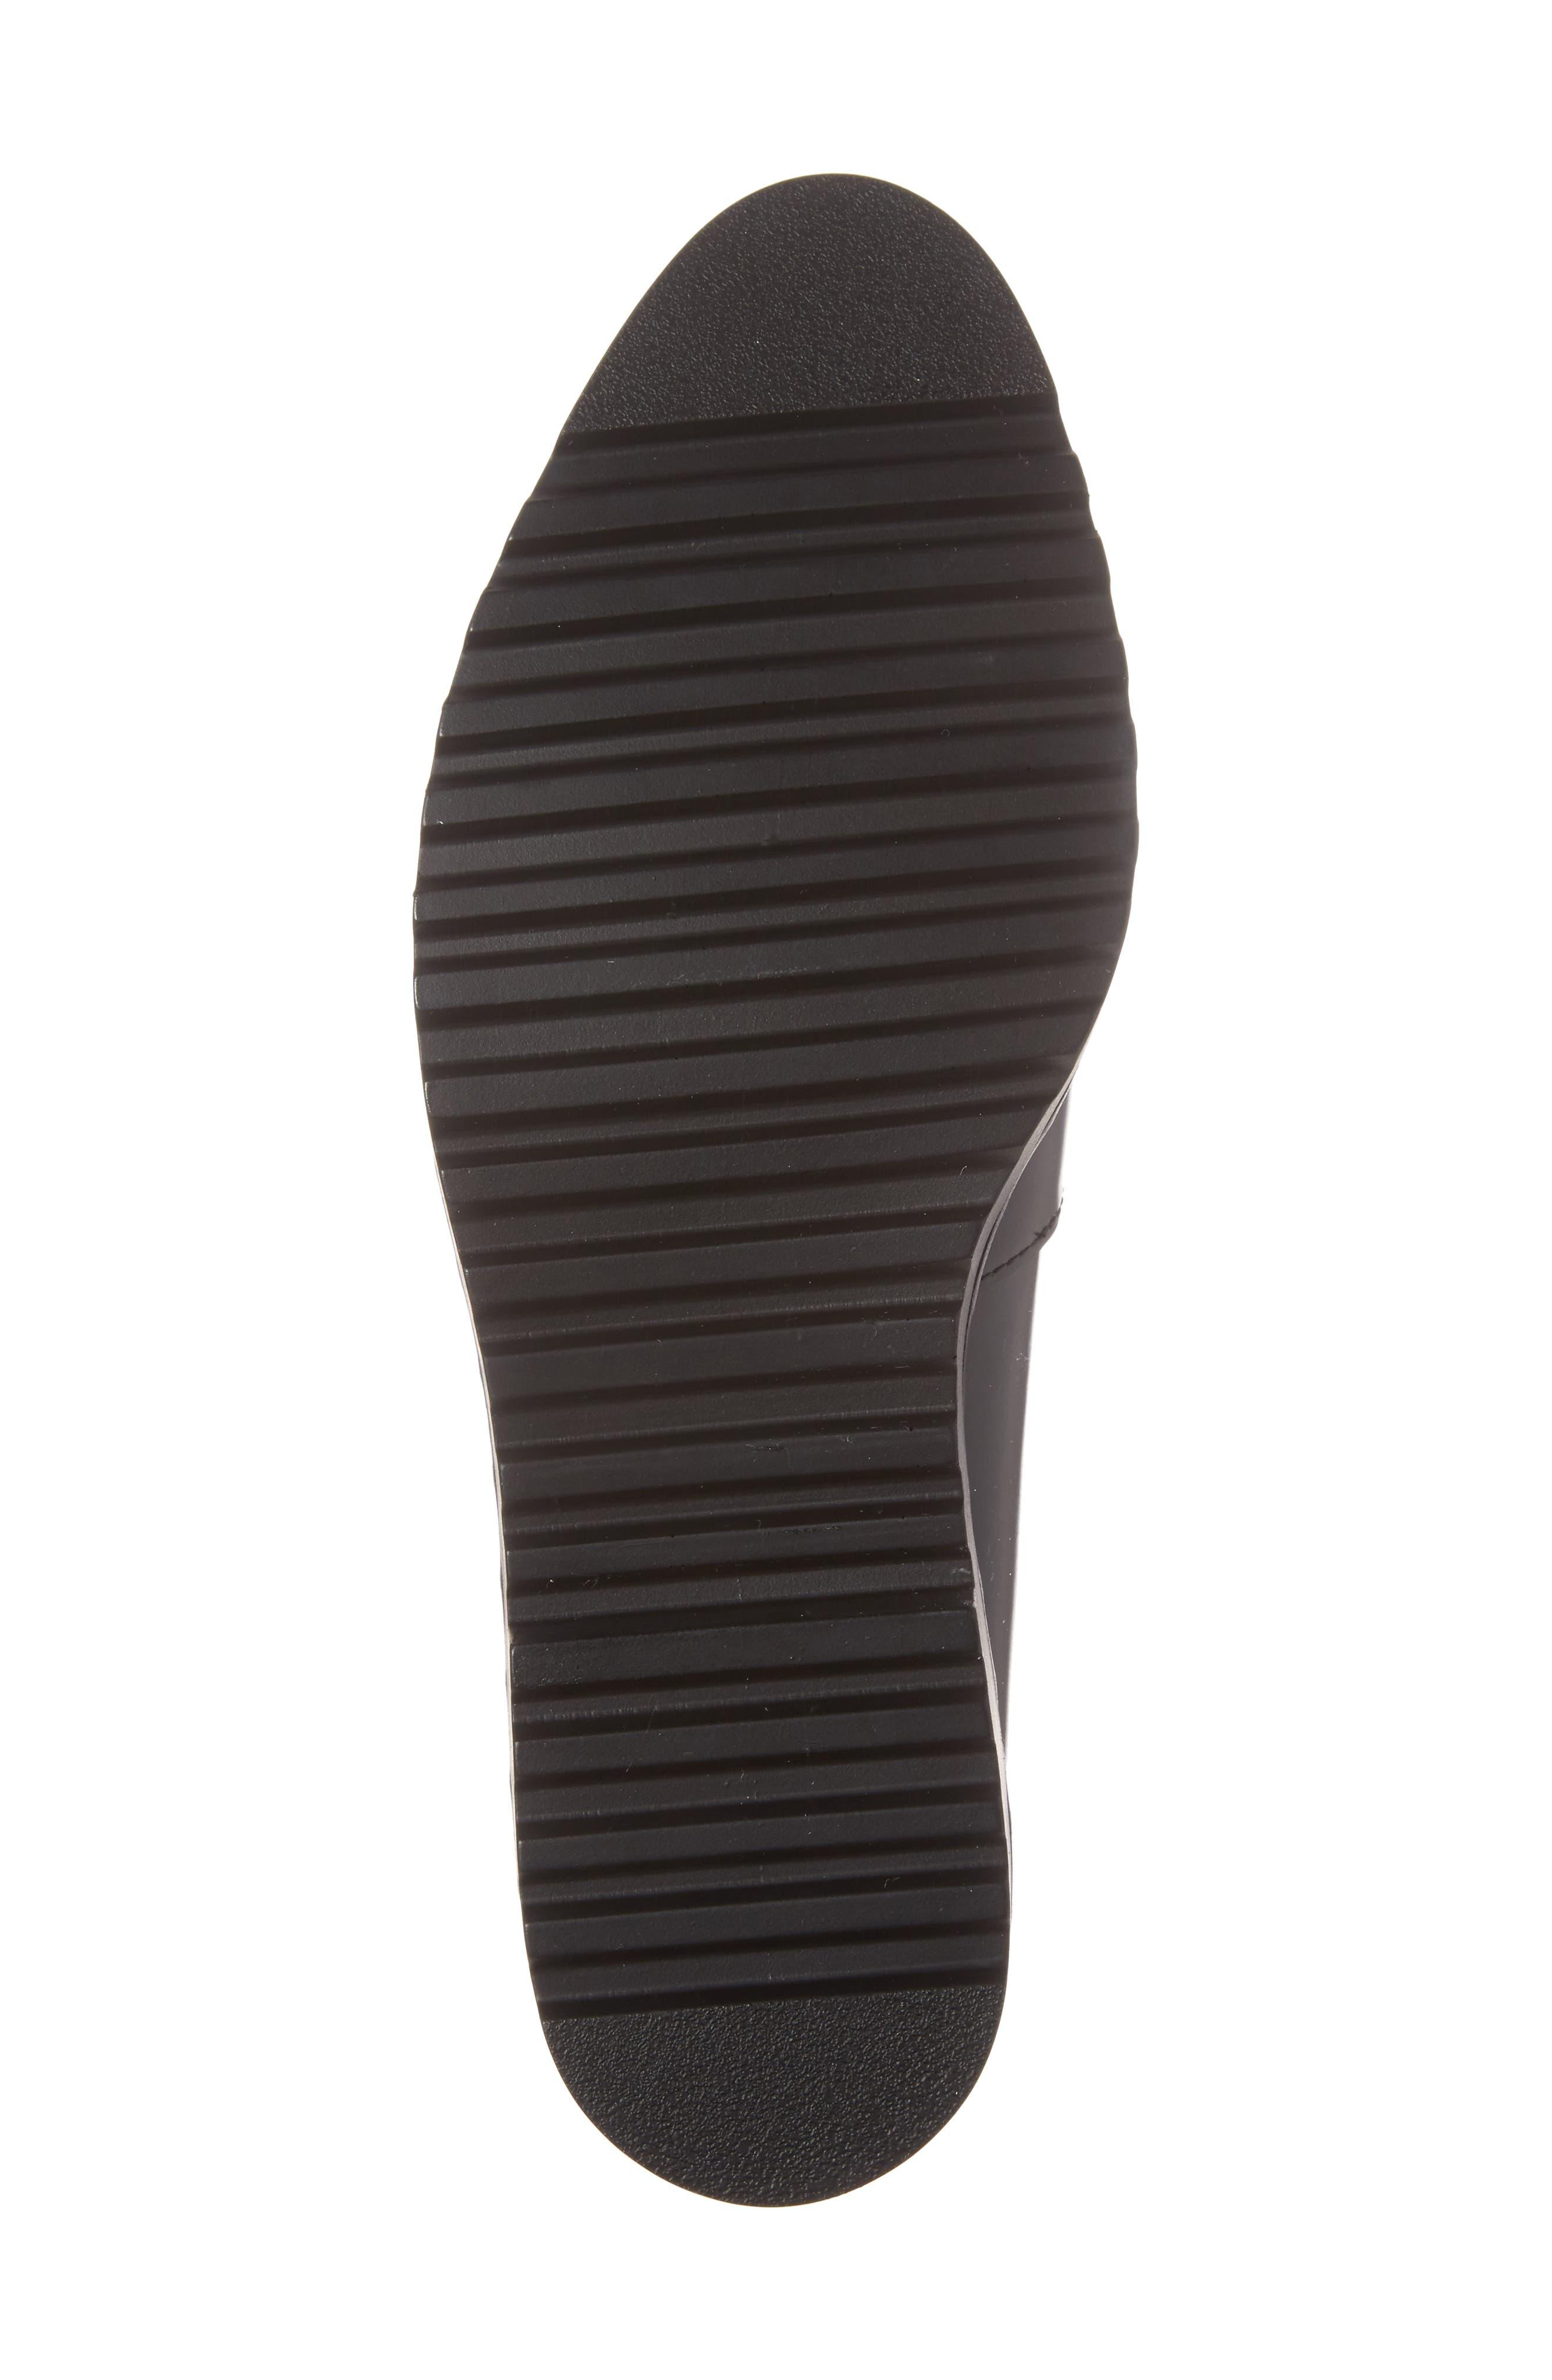 Emily Studded Flat,                             Alternate thumbnail 6, color,                             Black Box Leather